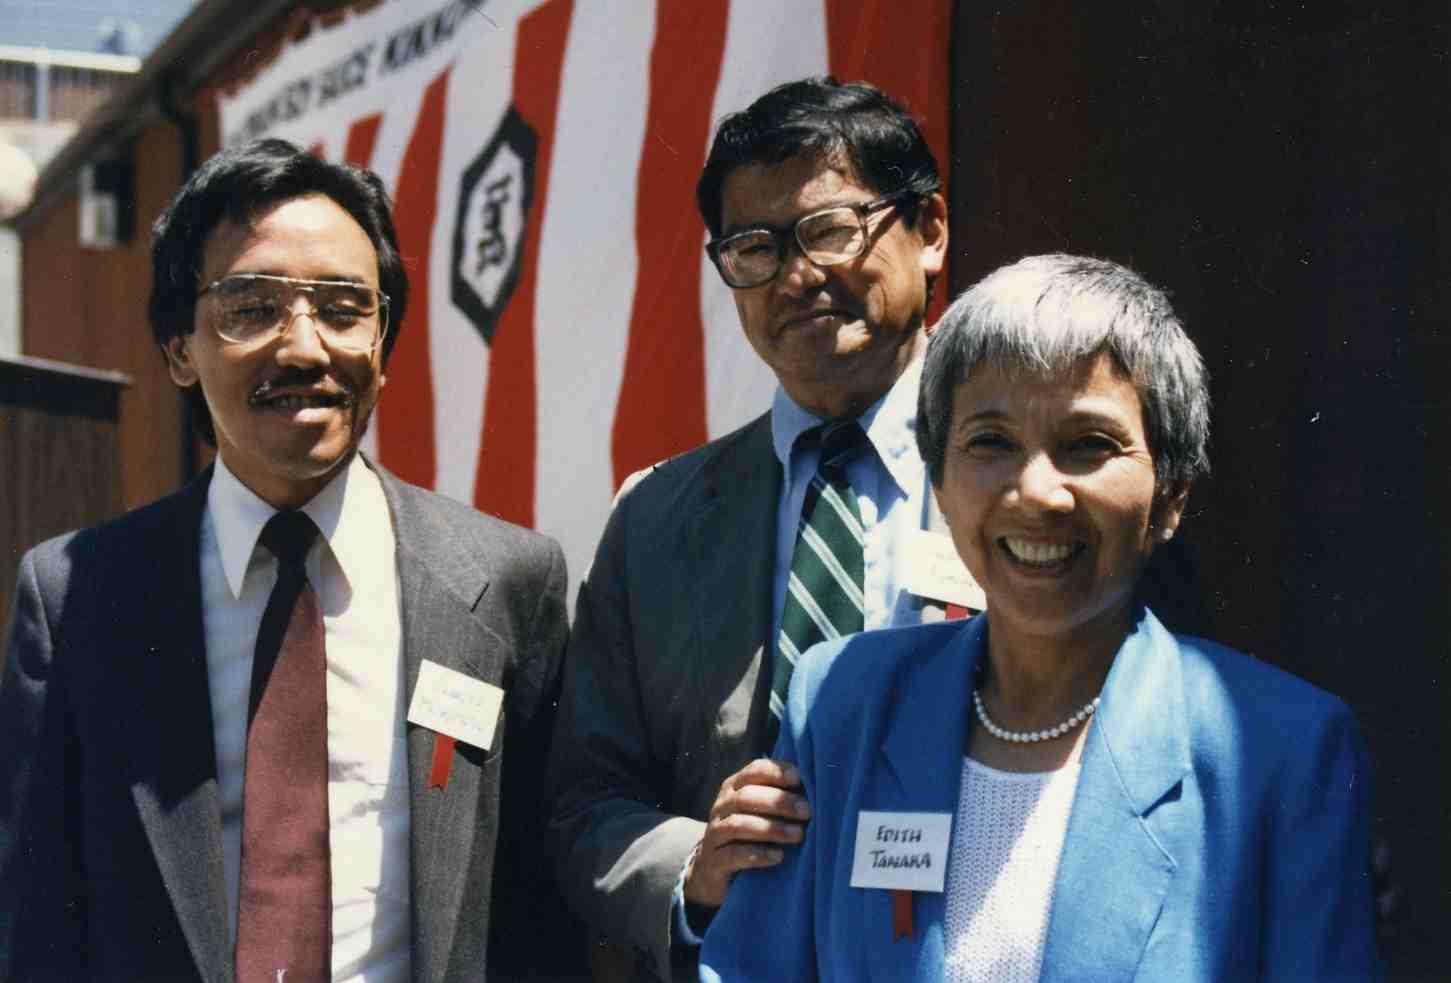 Honorees Edith Tanaka and Nob Fukuda with former JCCCNC Executive Director Charlie Morimoto